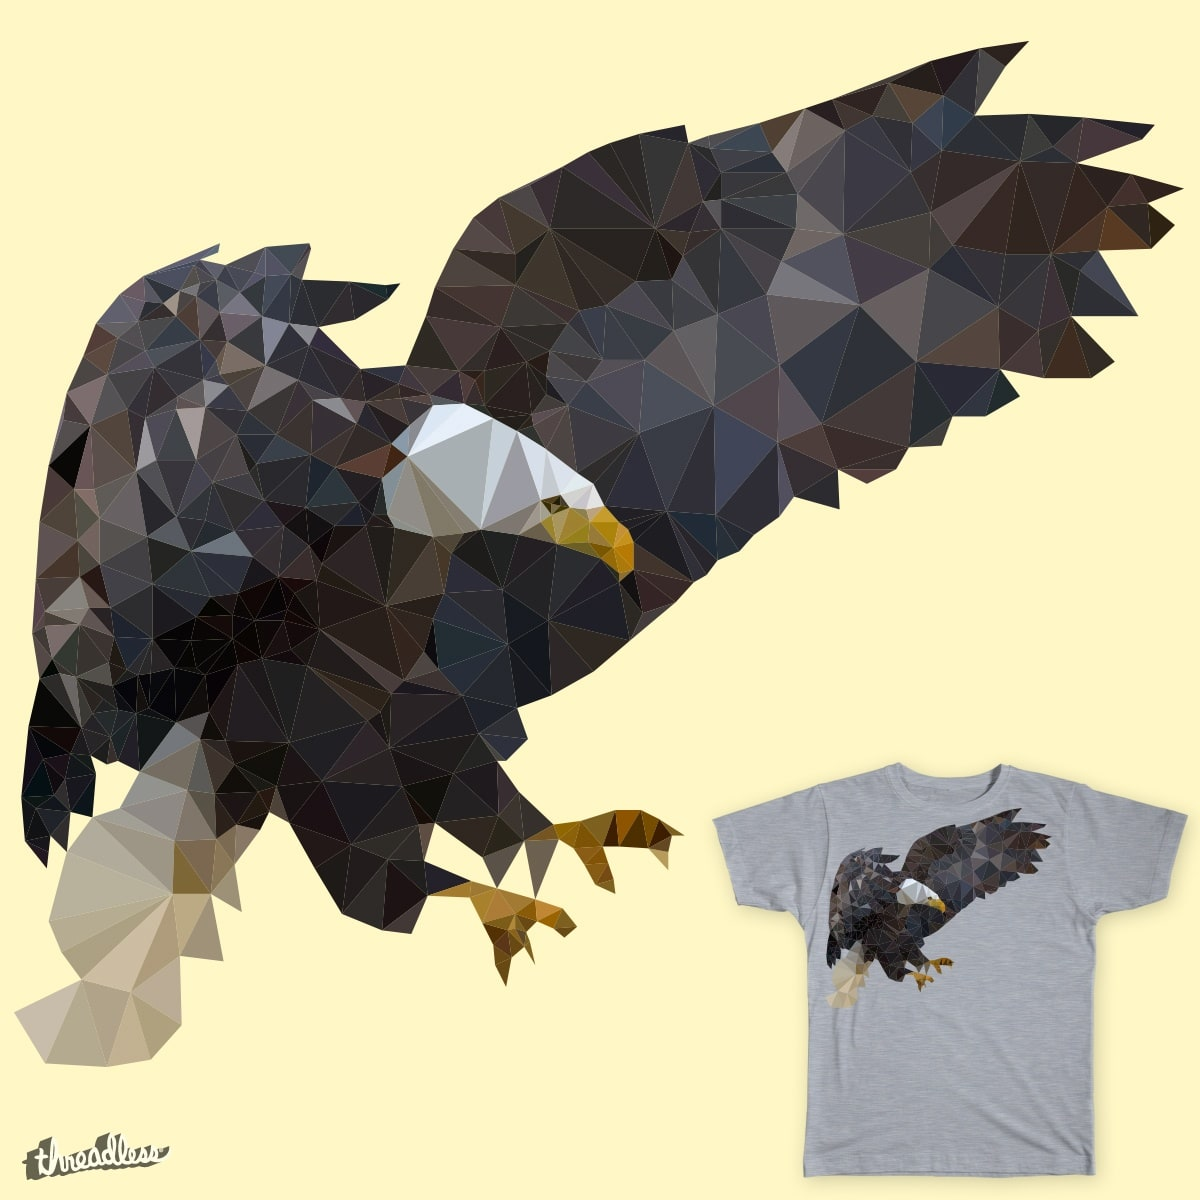 Score Triangle eagle by Zsuma on Threadless